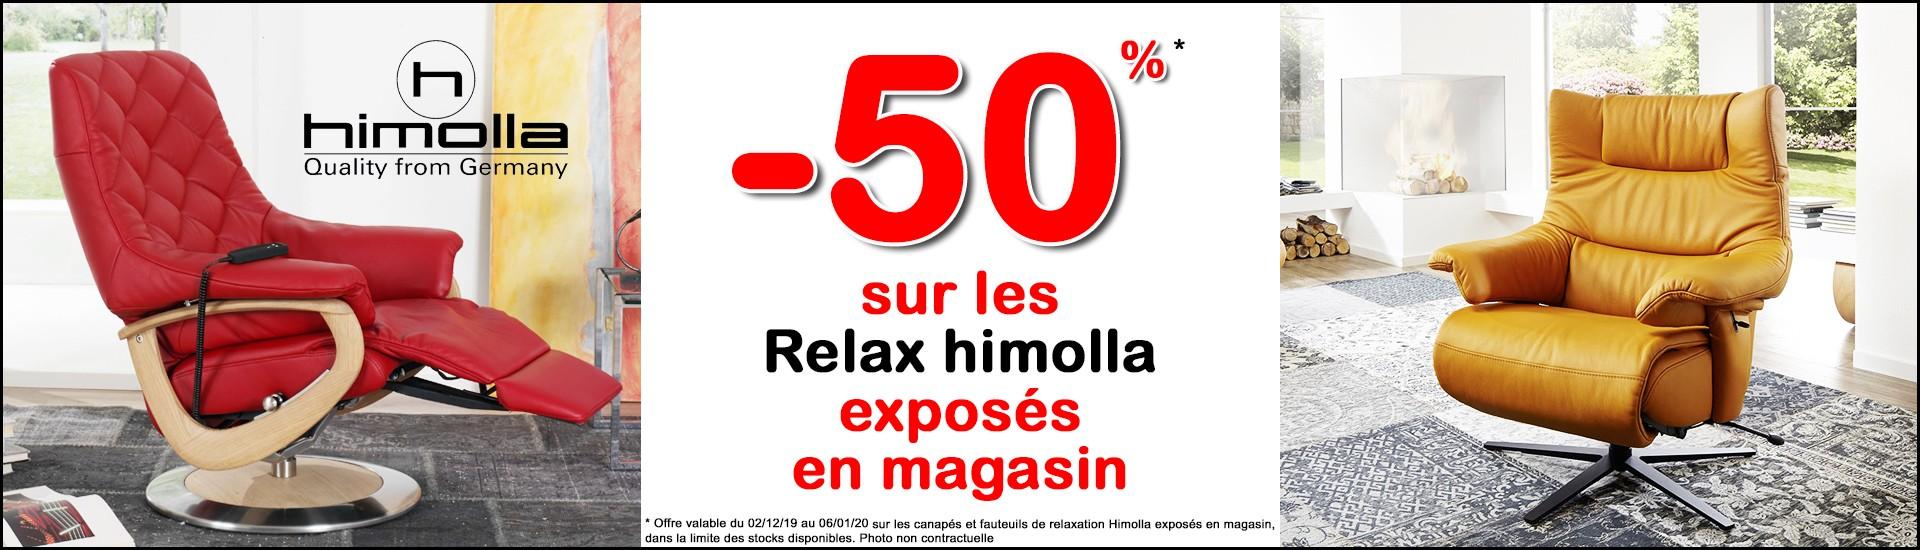 MEUBLES Meubles Clermont Ferrand LITERIE GLOBAL mnNw80